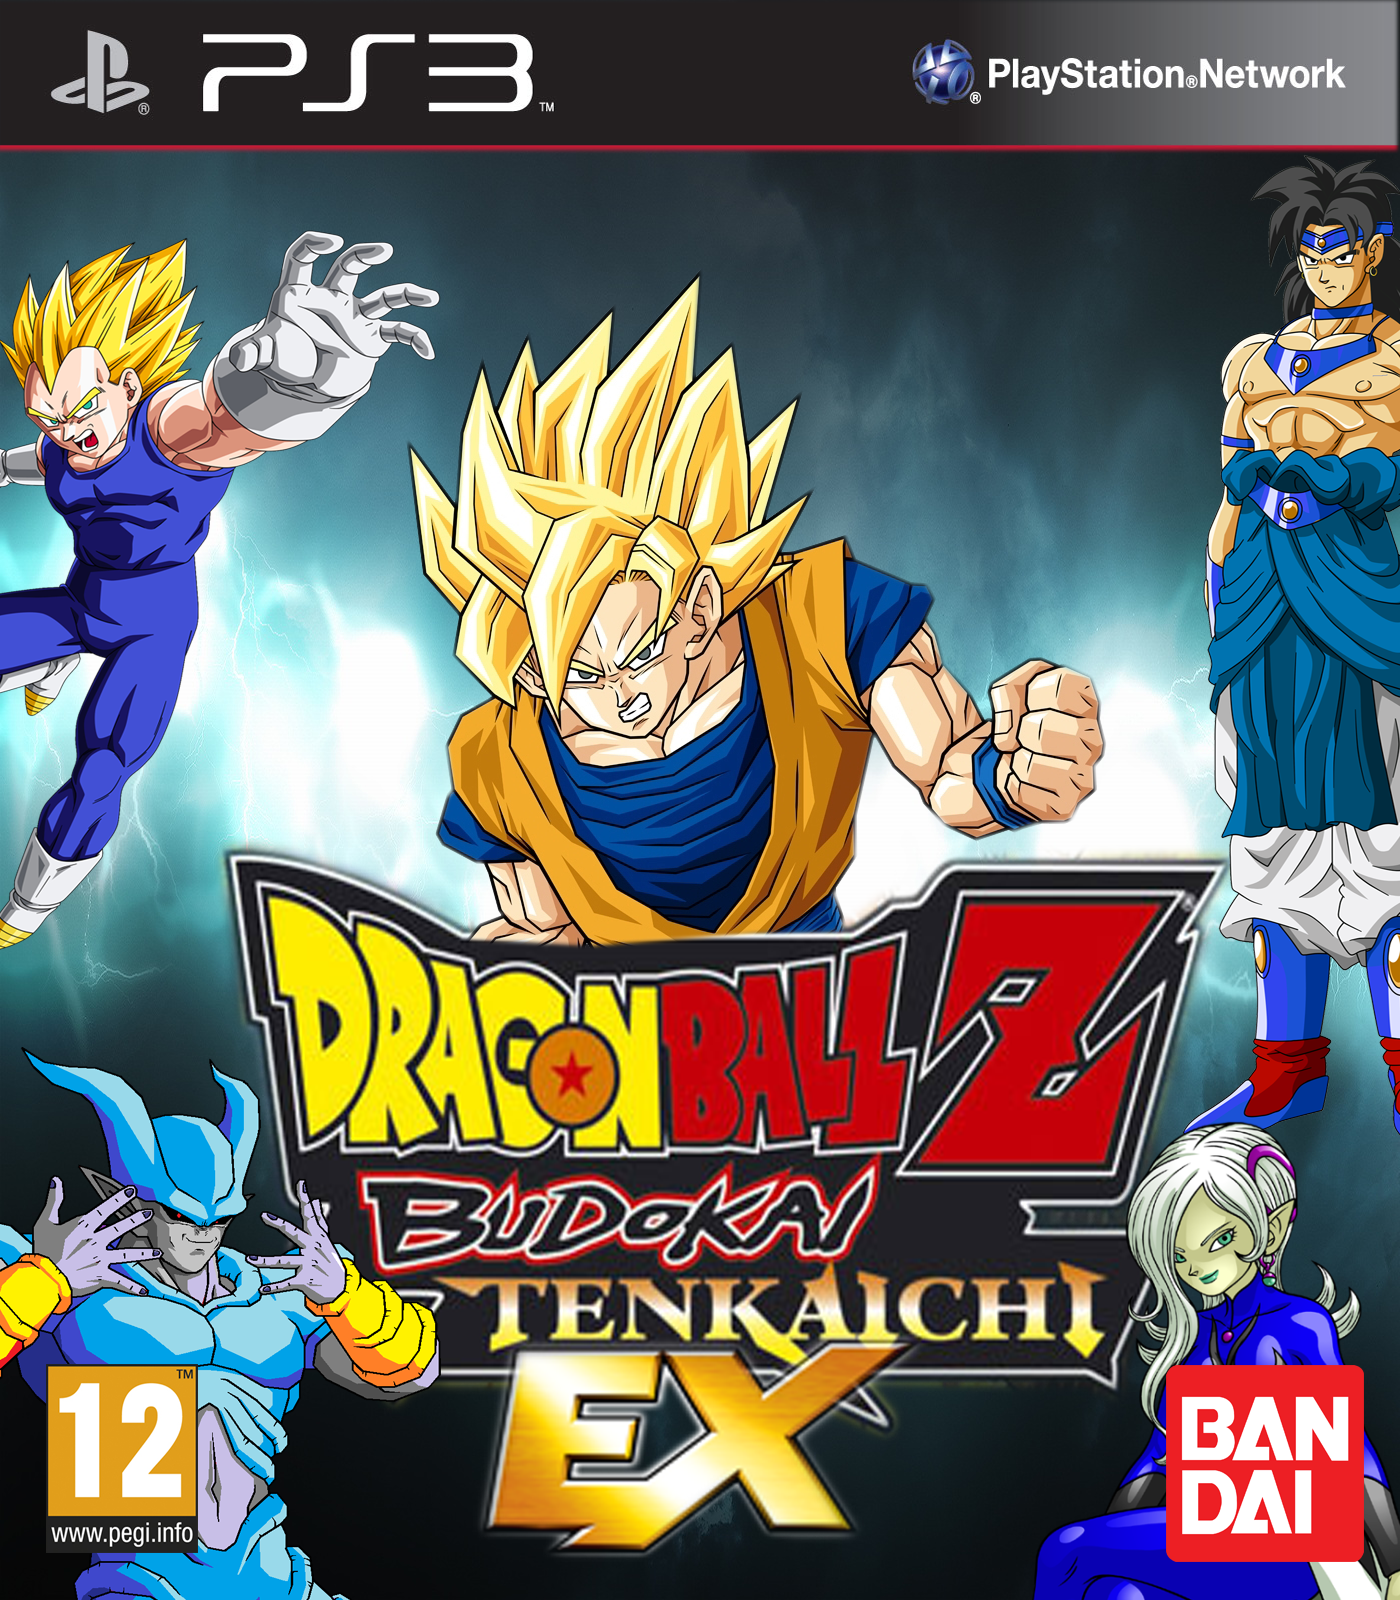 Dragon Ball Budokai Tenkaichi Ex Dragon Ball Fanon Wiki Fandom